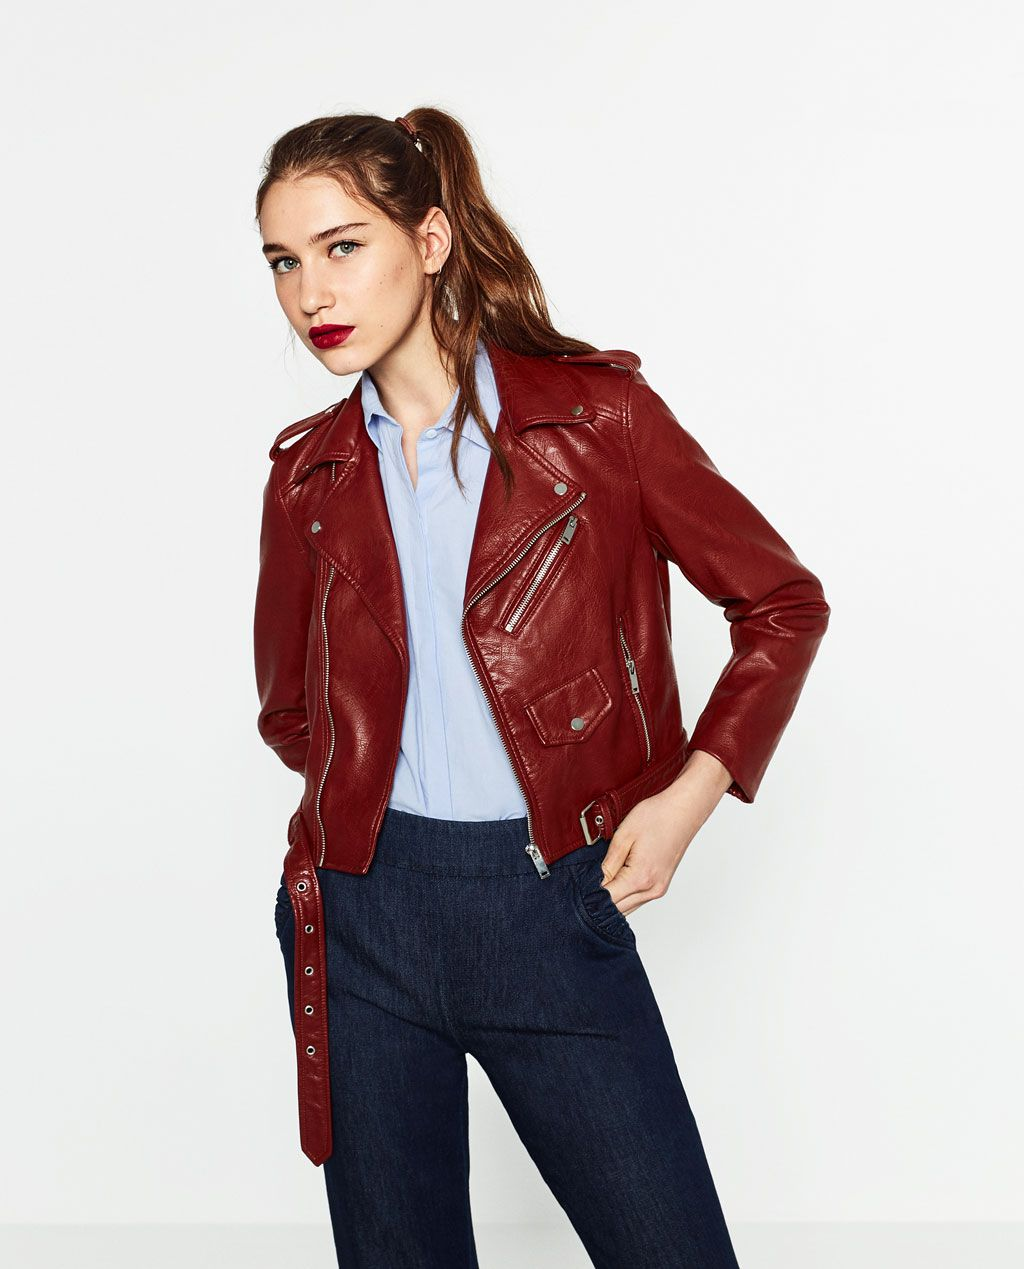 Épinglé sur Fall Fashion